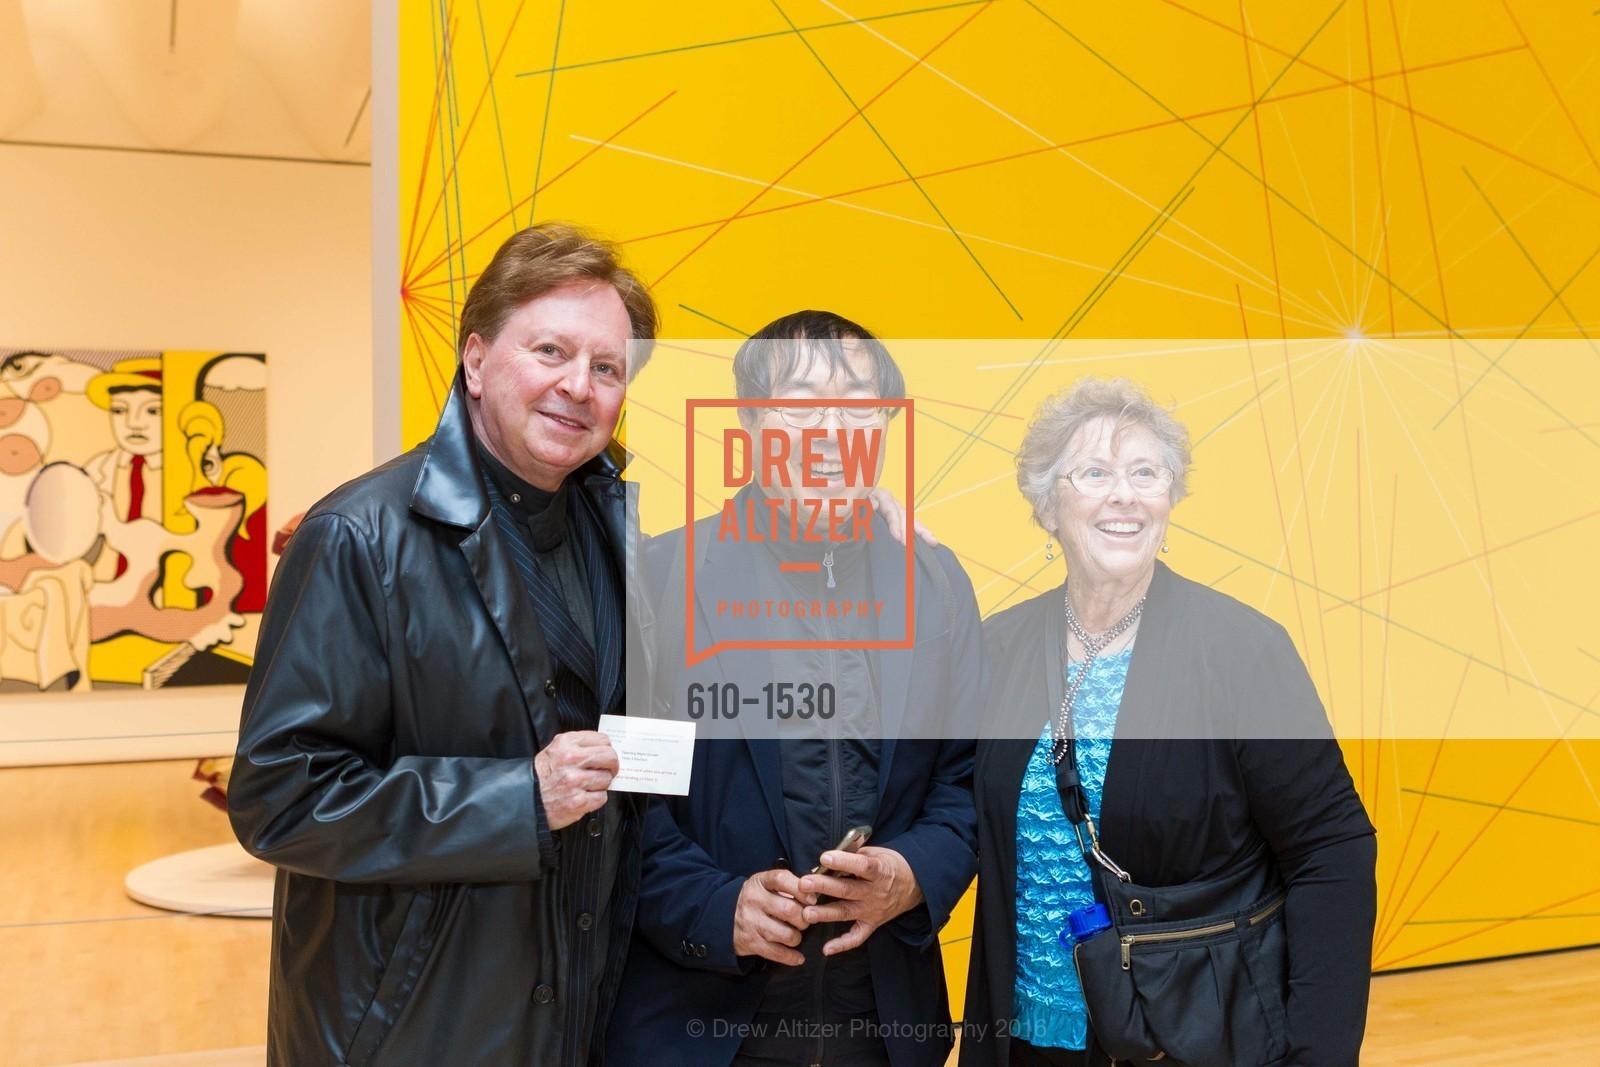 Gerald Casale, Vee Vale, Joan Conner, Photo #610-1530